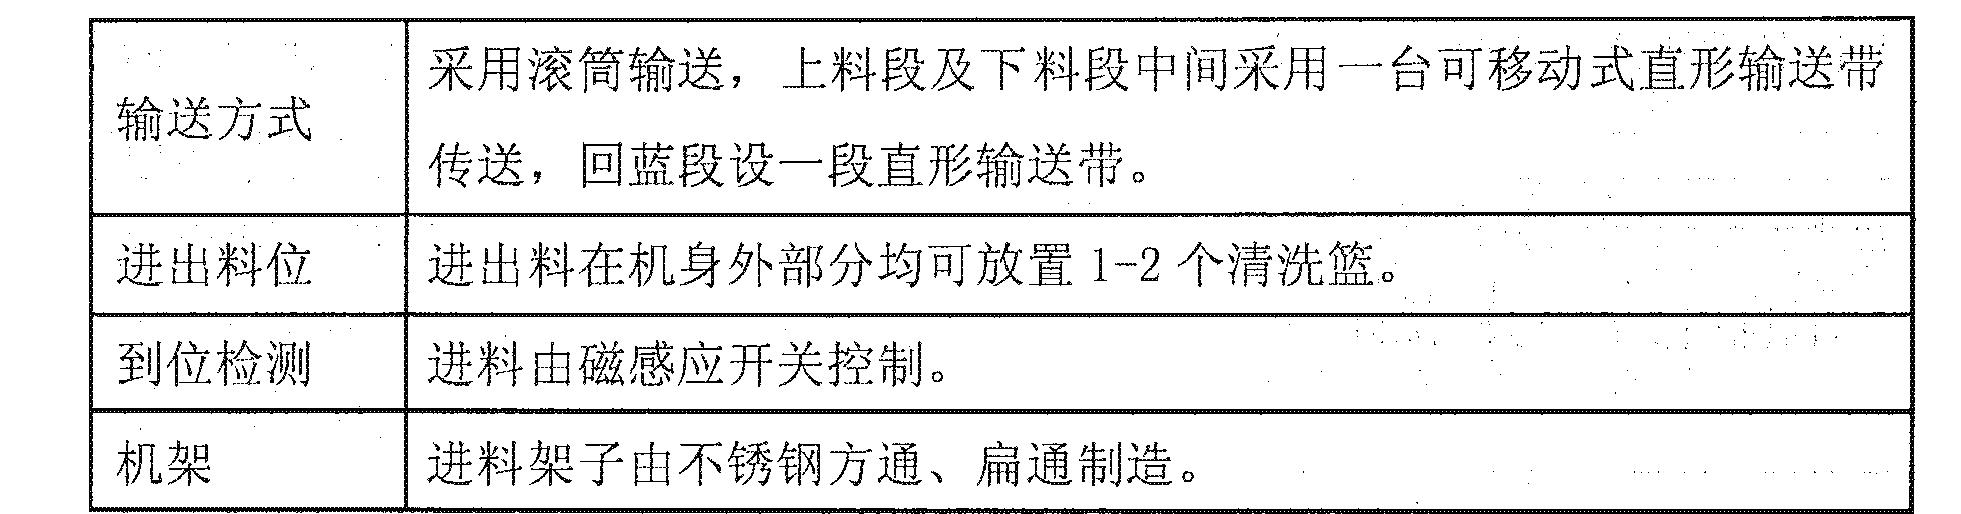 Figure CN204035120UD00123